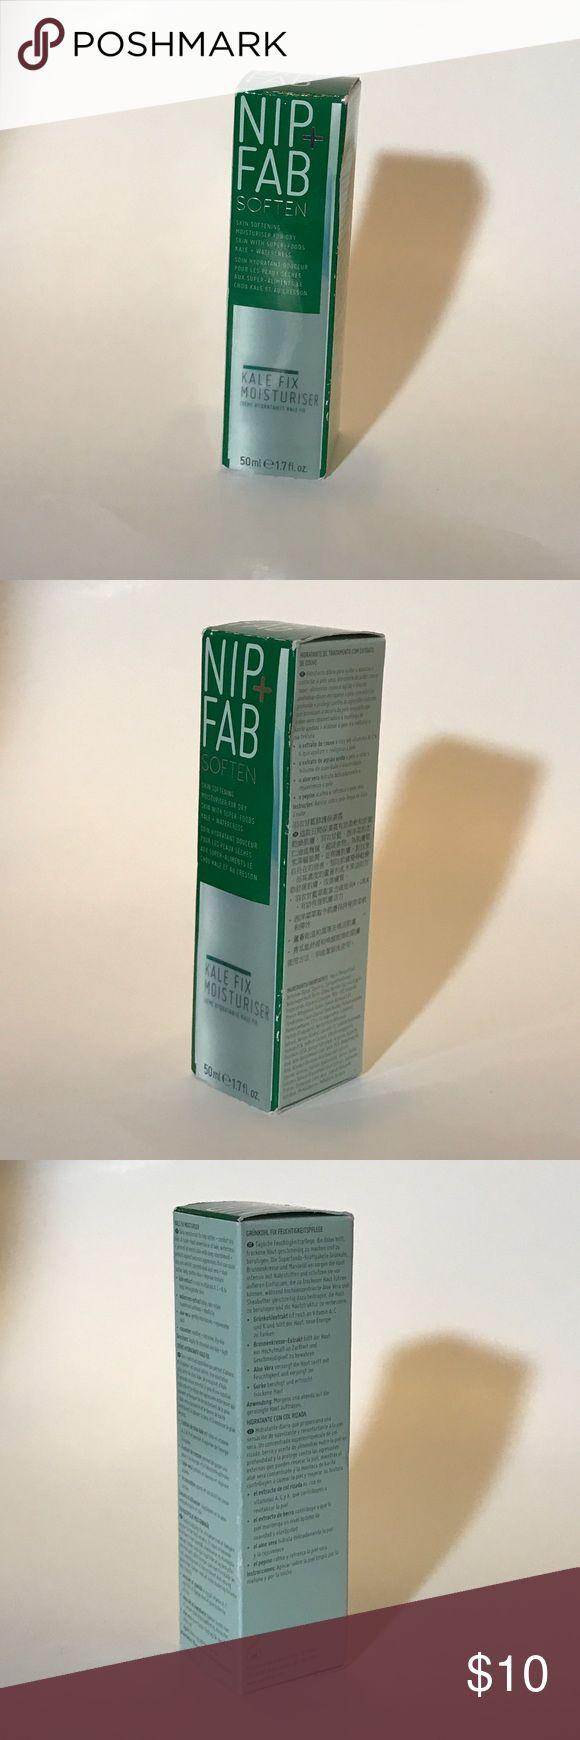 Nip + Fab SOFTEN Kale Fix Moisturiser 50ml e 1.7oz SKIN SOFTENING MOISTURISER FOR DRY SKIN WITH SUPER-FOODS KALE- WATERCRESS. CREME HYDRATANTE KALE FIX. Nip + Fab Makeup